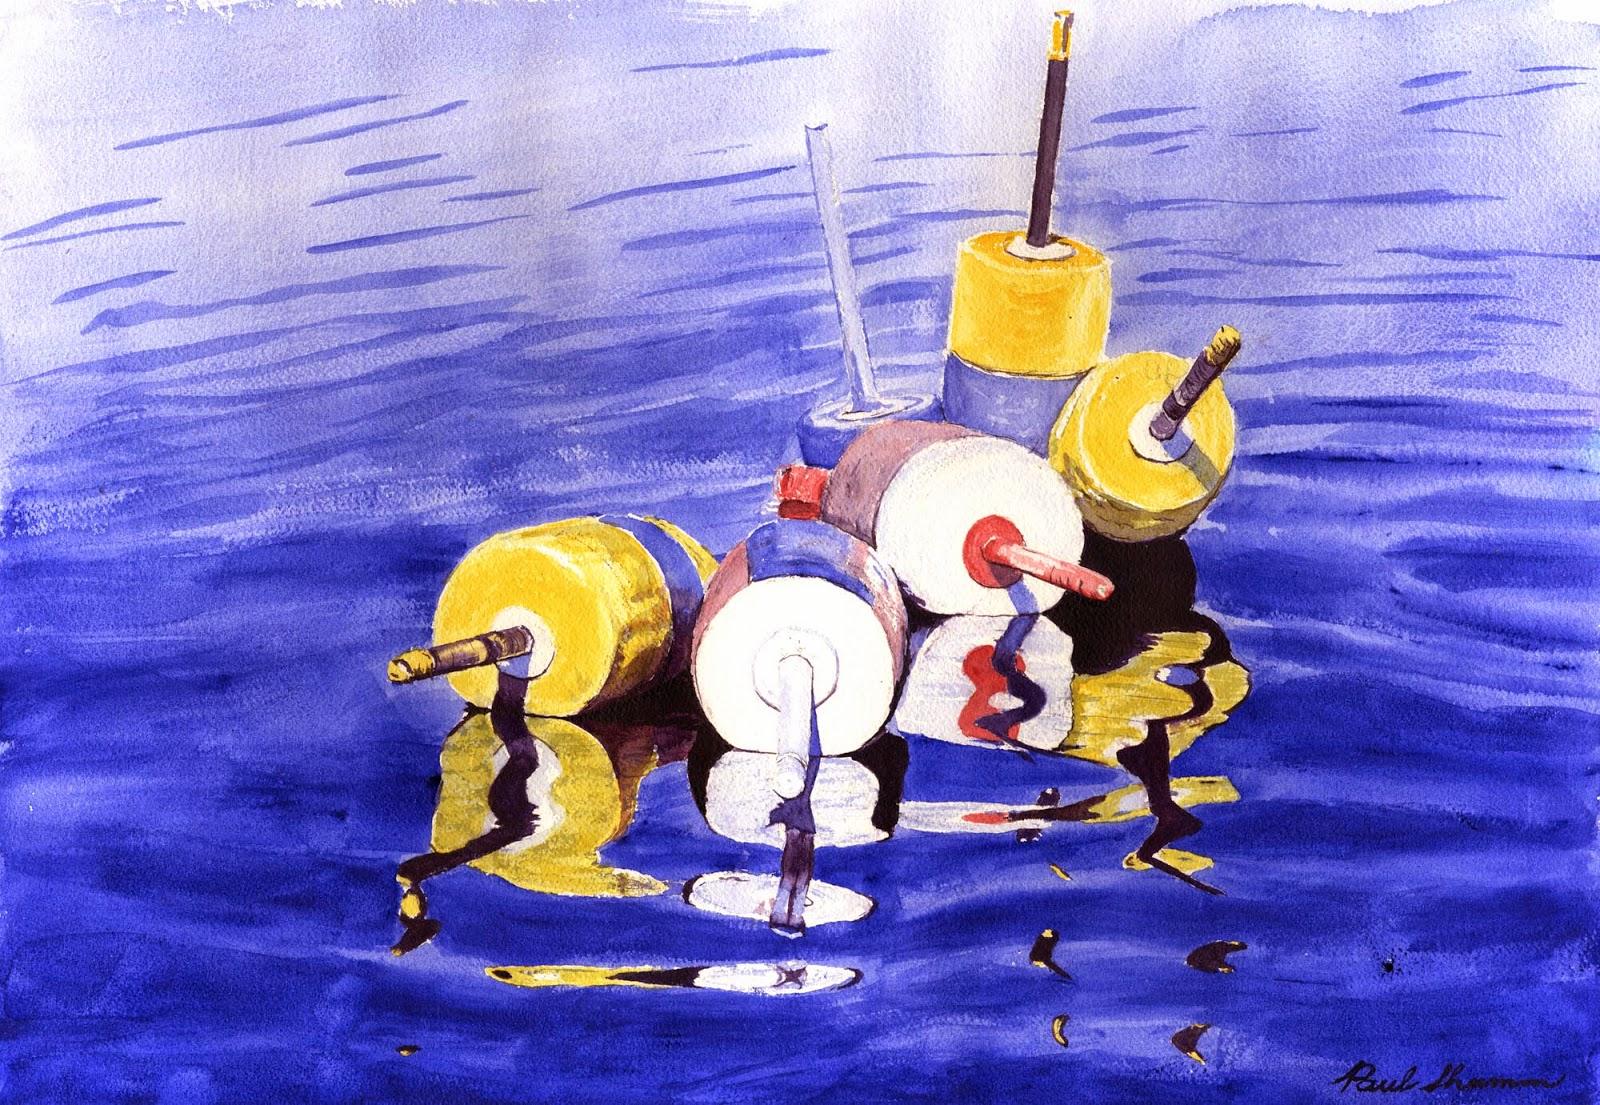 """Buoy Knot"" by Paul Sherman"